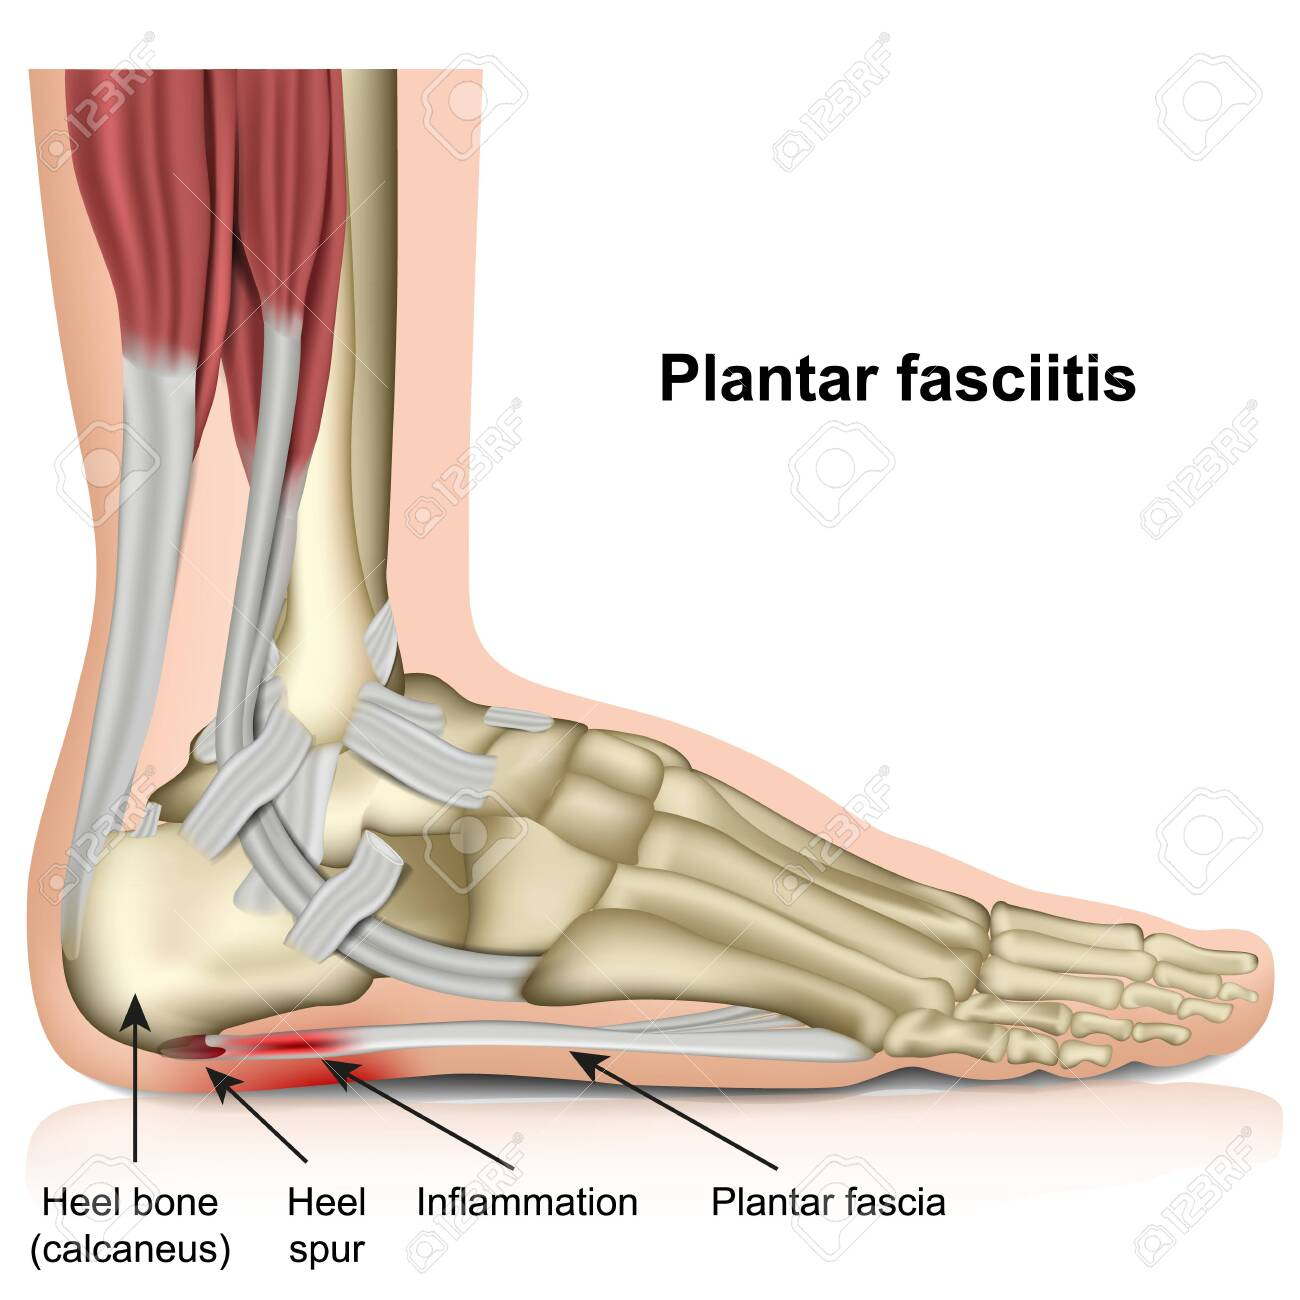 Plantar fasciitis 3d medical vector illustration on white background - 124273737